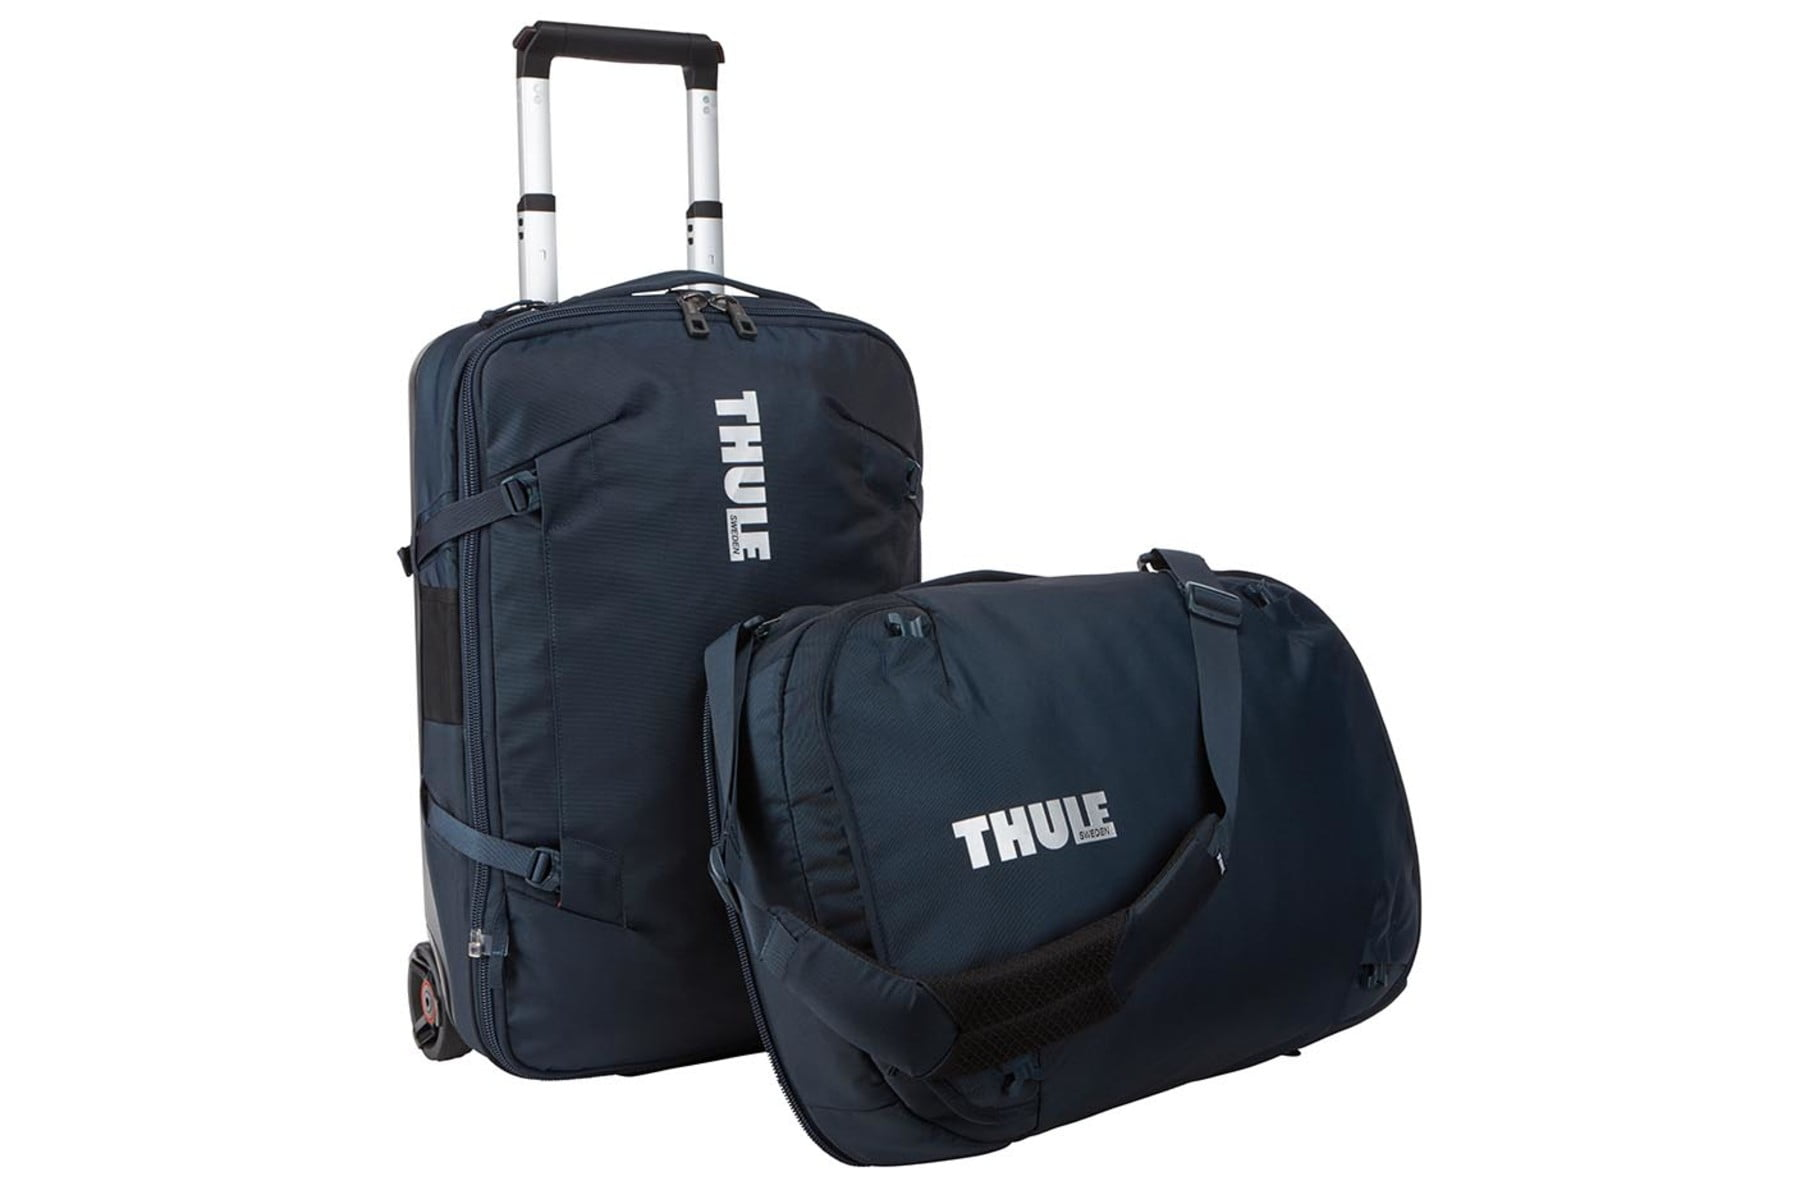 Geanta voiaj Thule Subterra Luggage 55cm22 Mineral 3